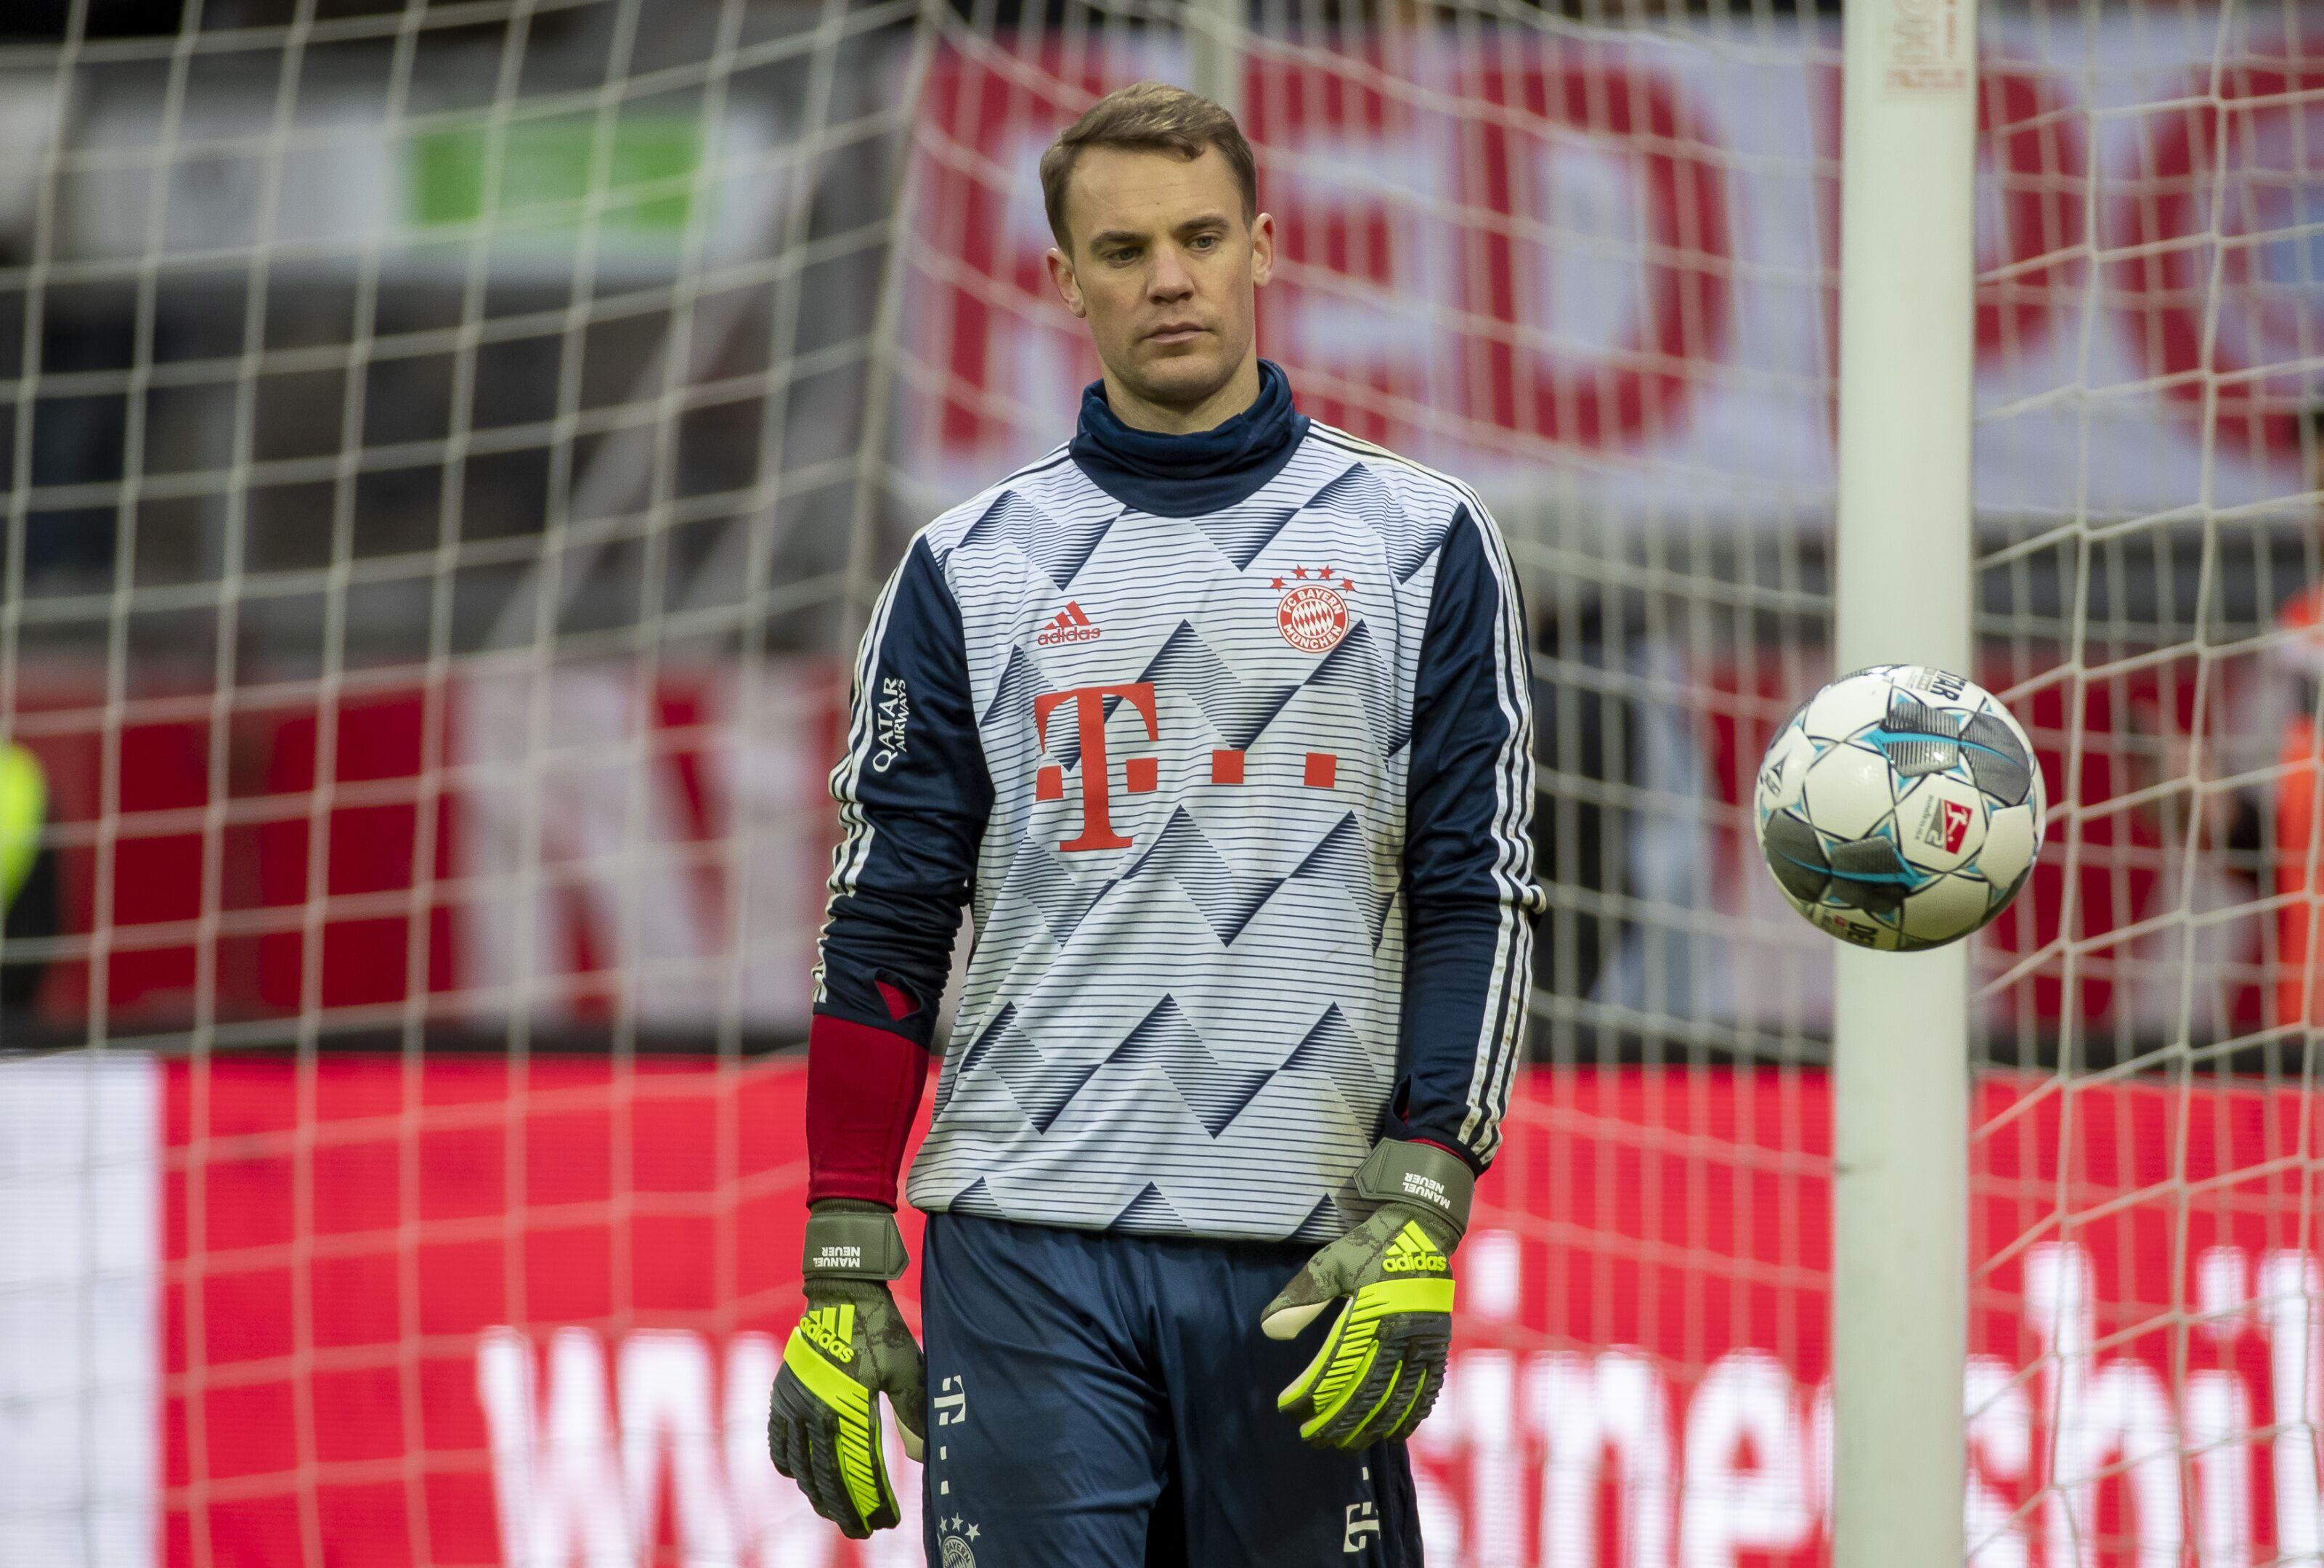 Bayern Munich: Manuel Neuer emerges as a transfer target for Juventus